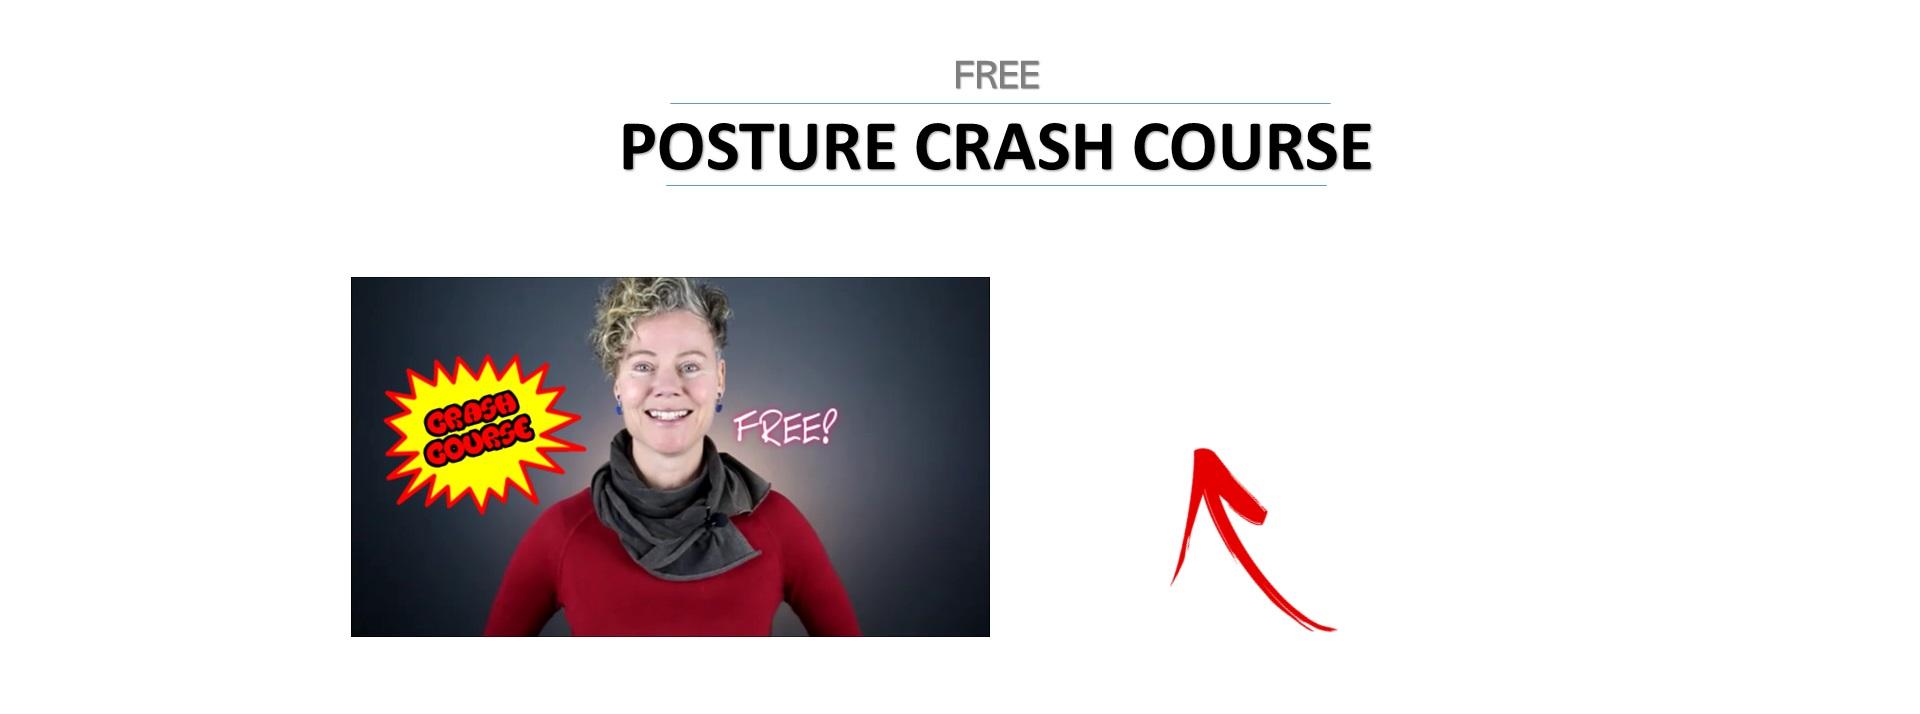 Posture Crash Course